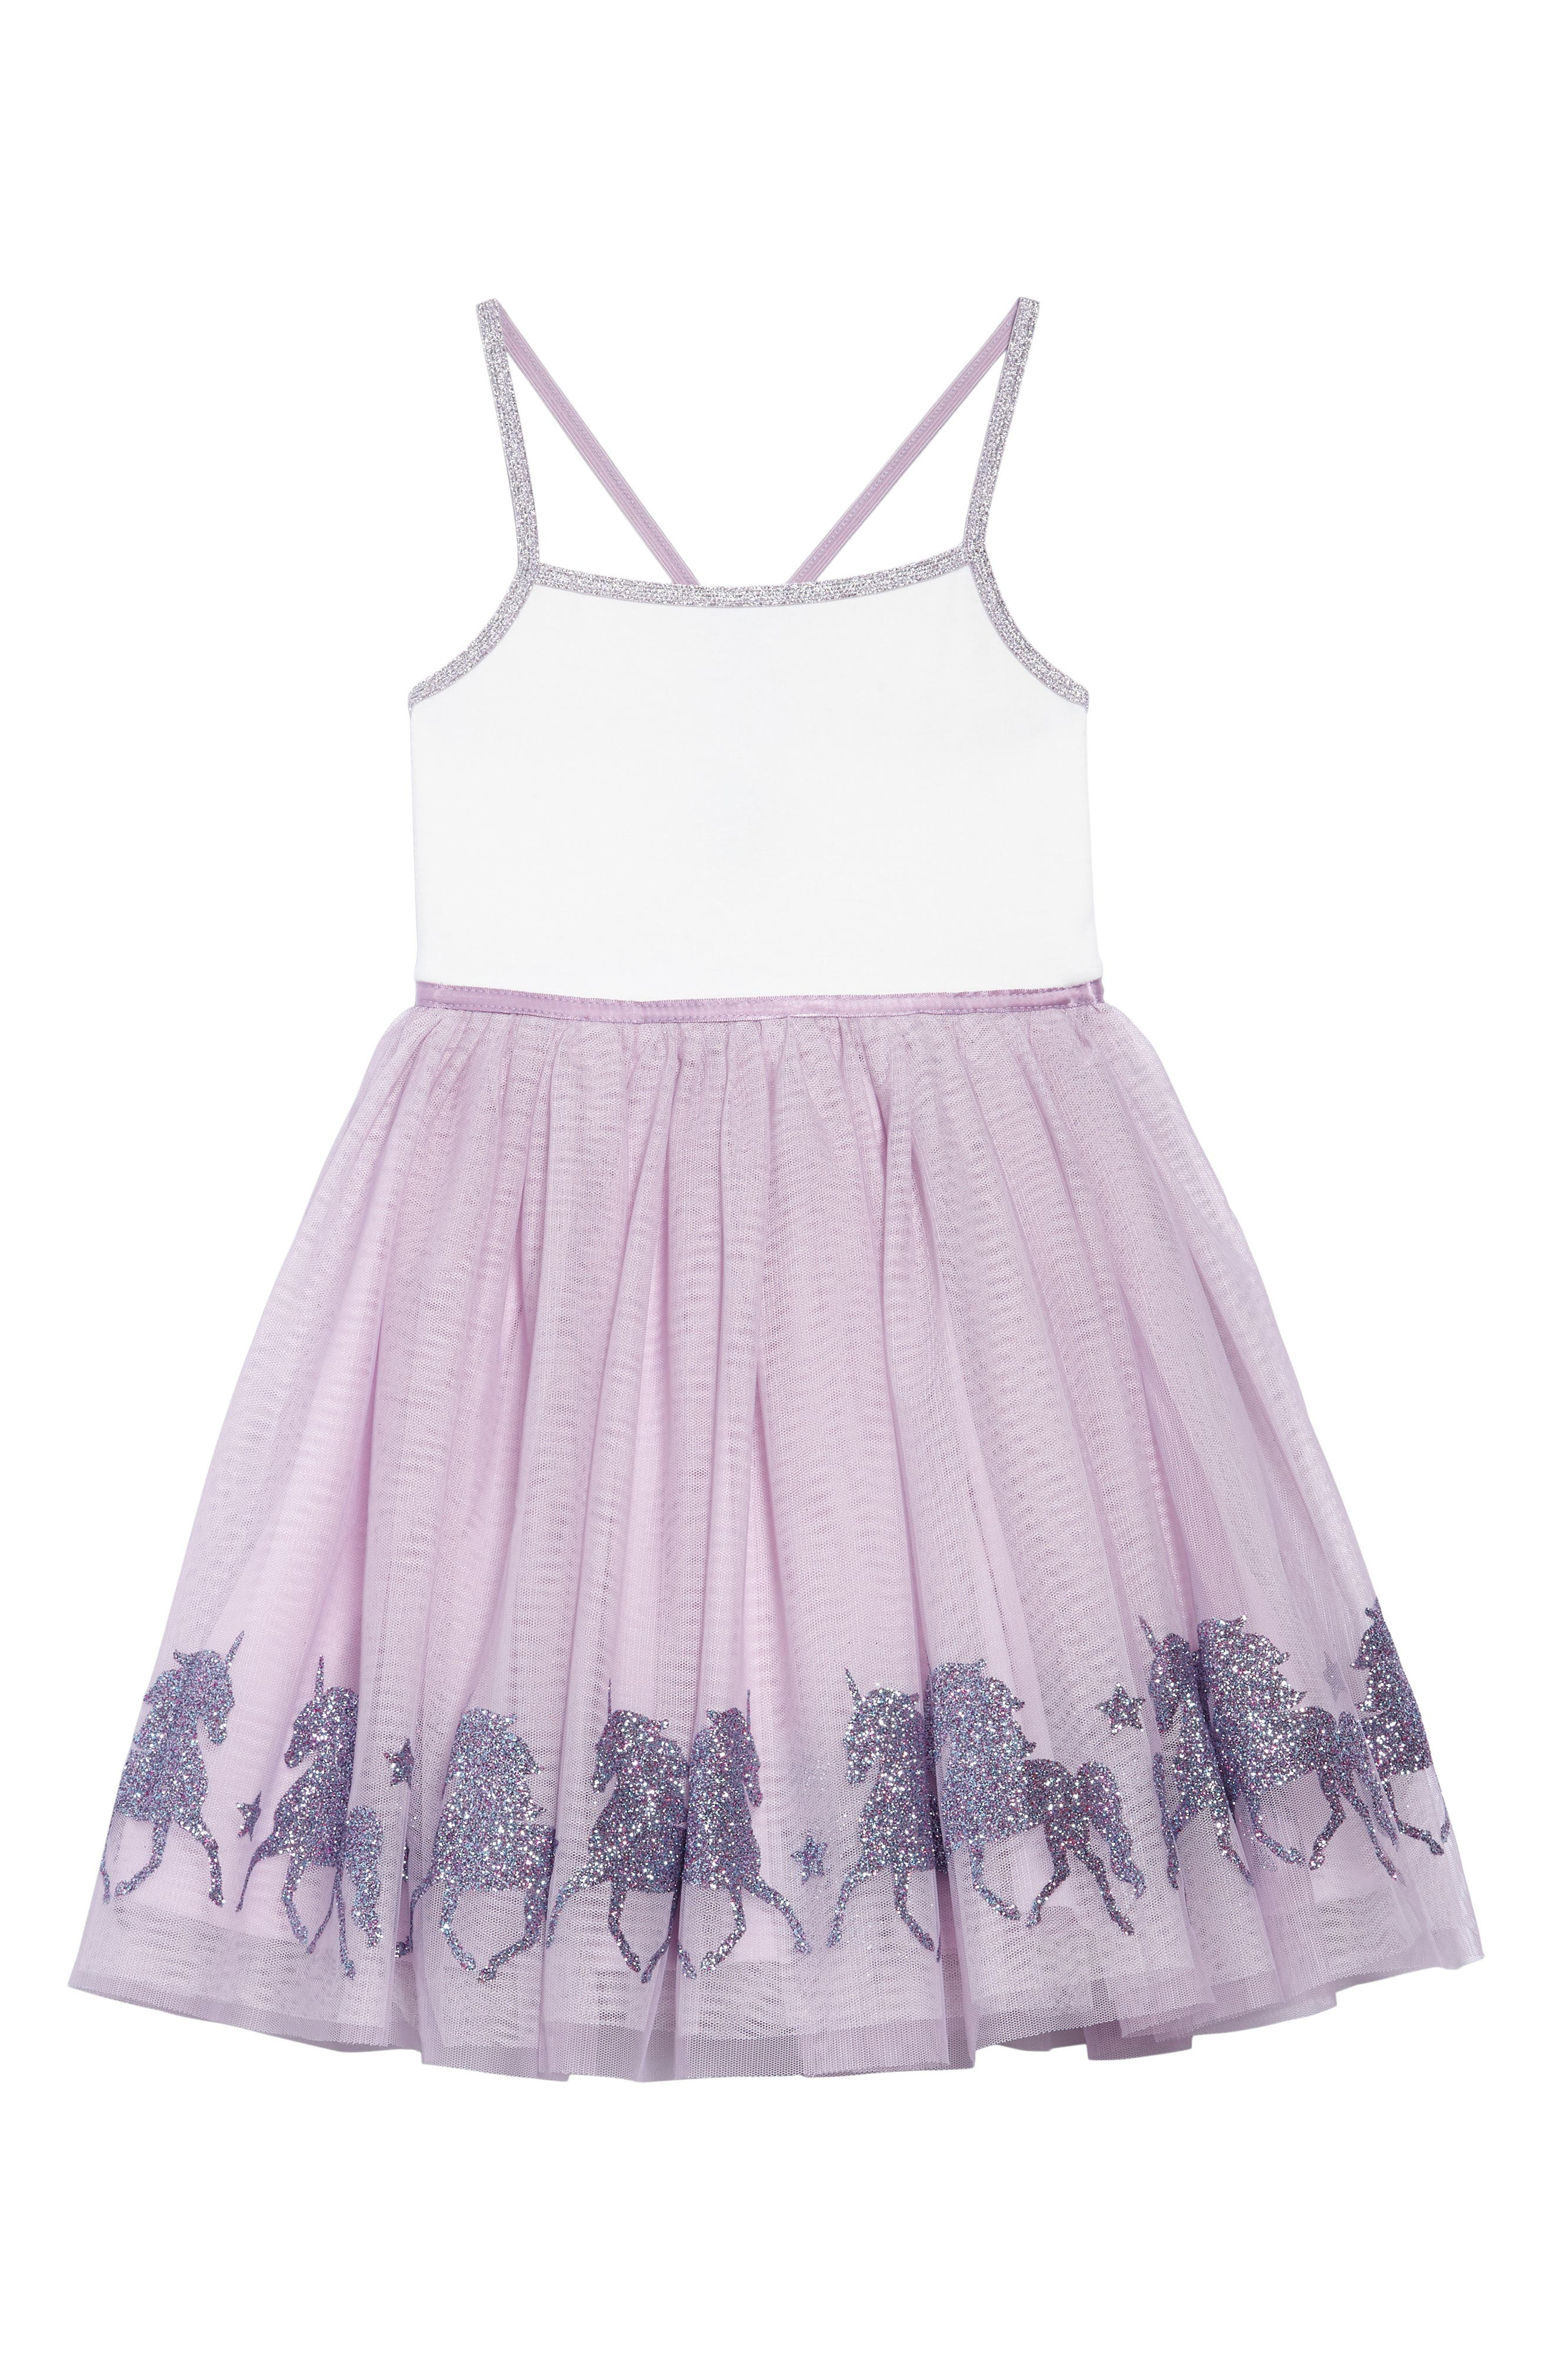 Glittery Unicorn Ballerina Dress,                             Main thumbnail 1, color,                             LAVENDER